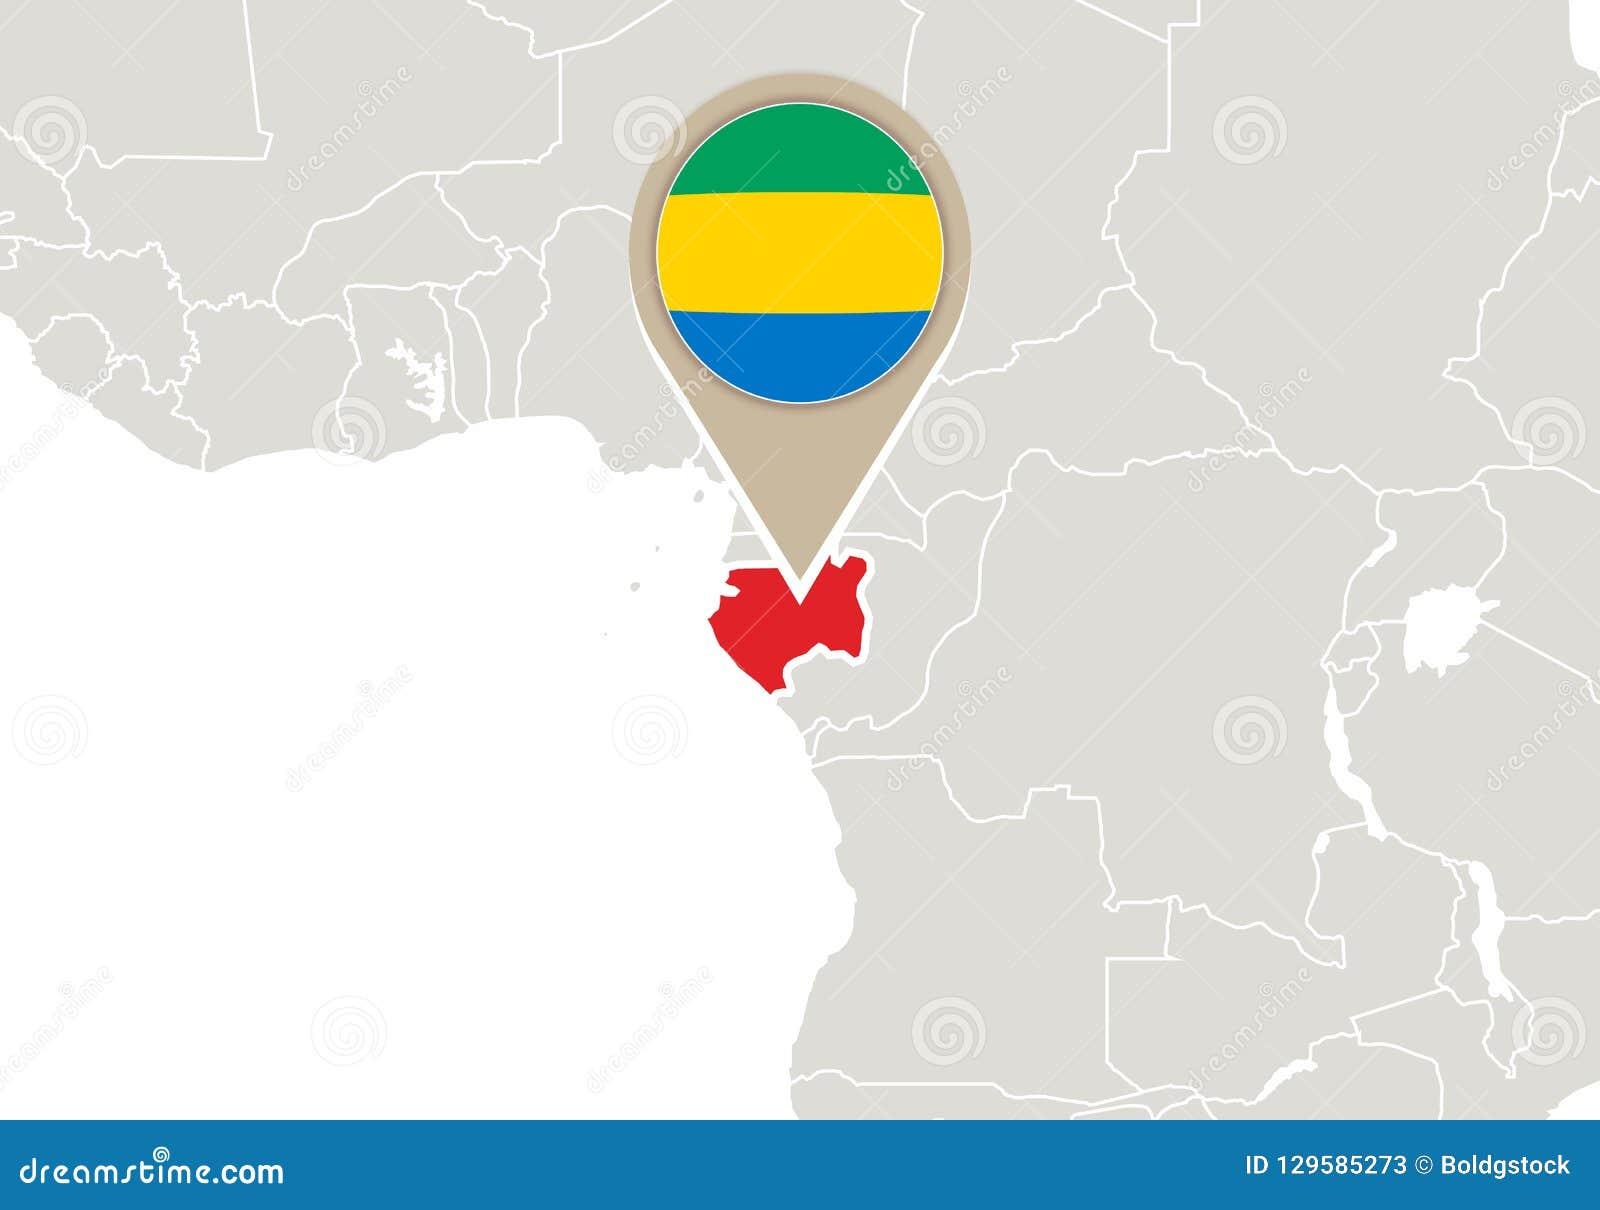 Gabon World Map.Gabon On World Map Stock Vector Illustration Of Sign 129585273